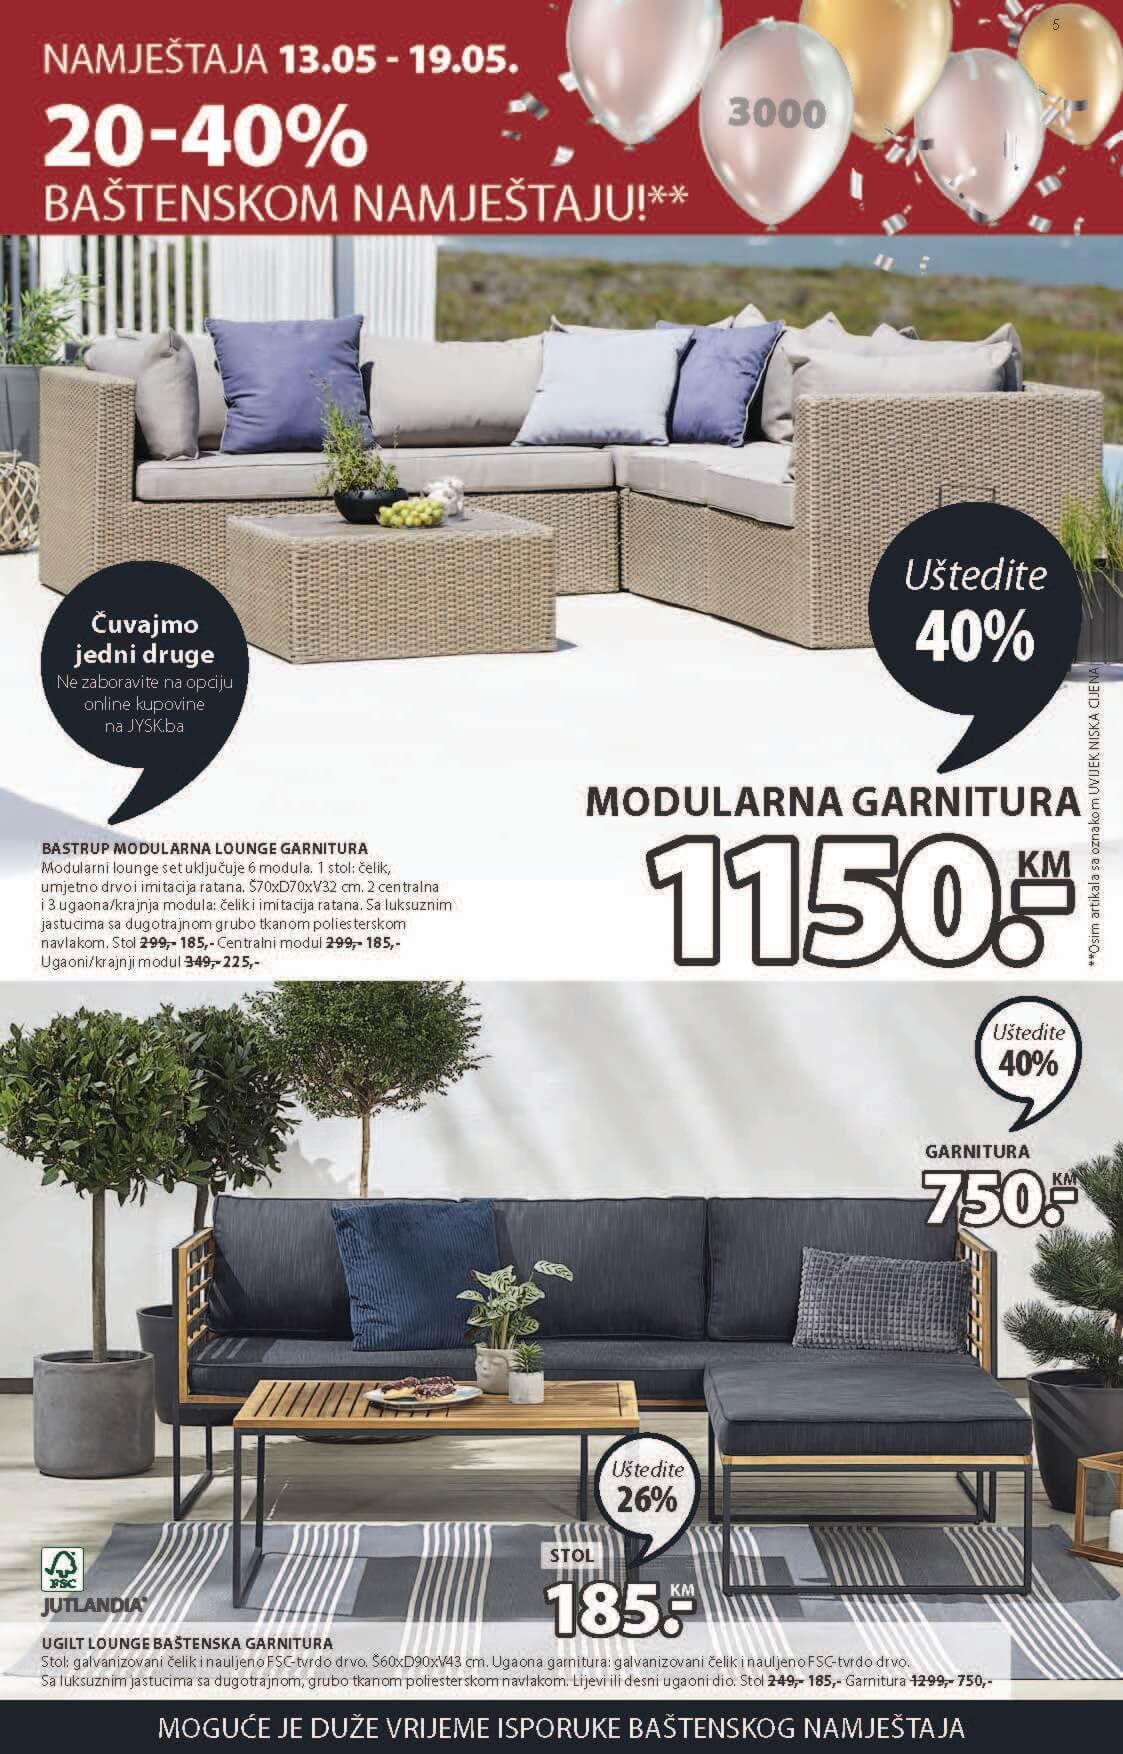 JYSK Katalog Akcijska ponuda MAJ 13.05.2021. 26.05.2021 ekatalozi.com Page 06 1